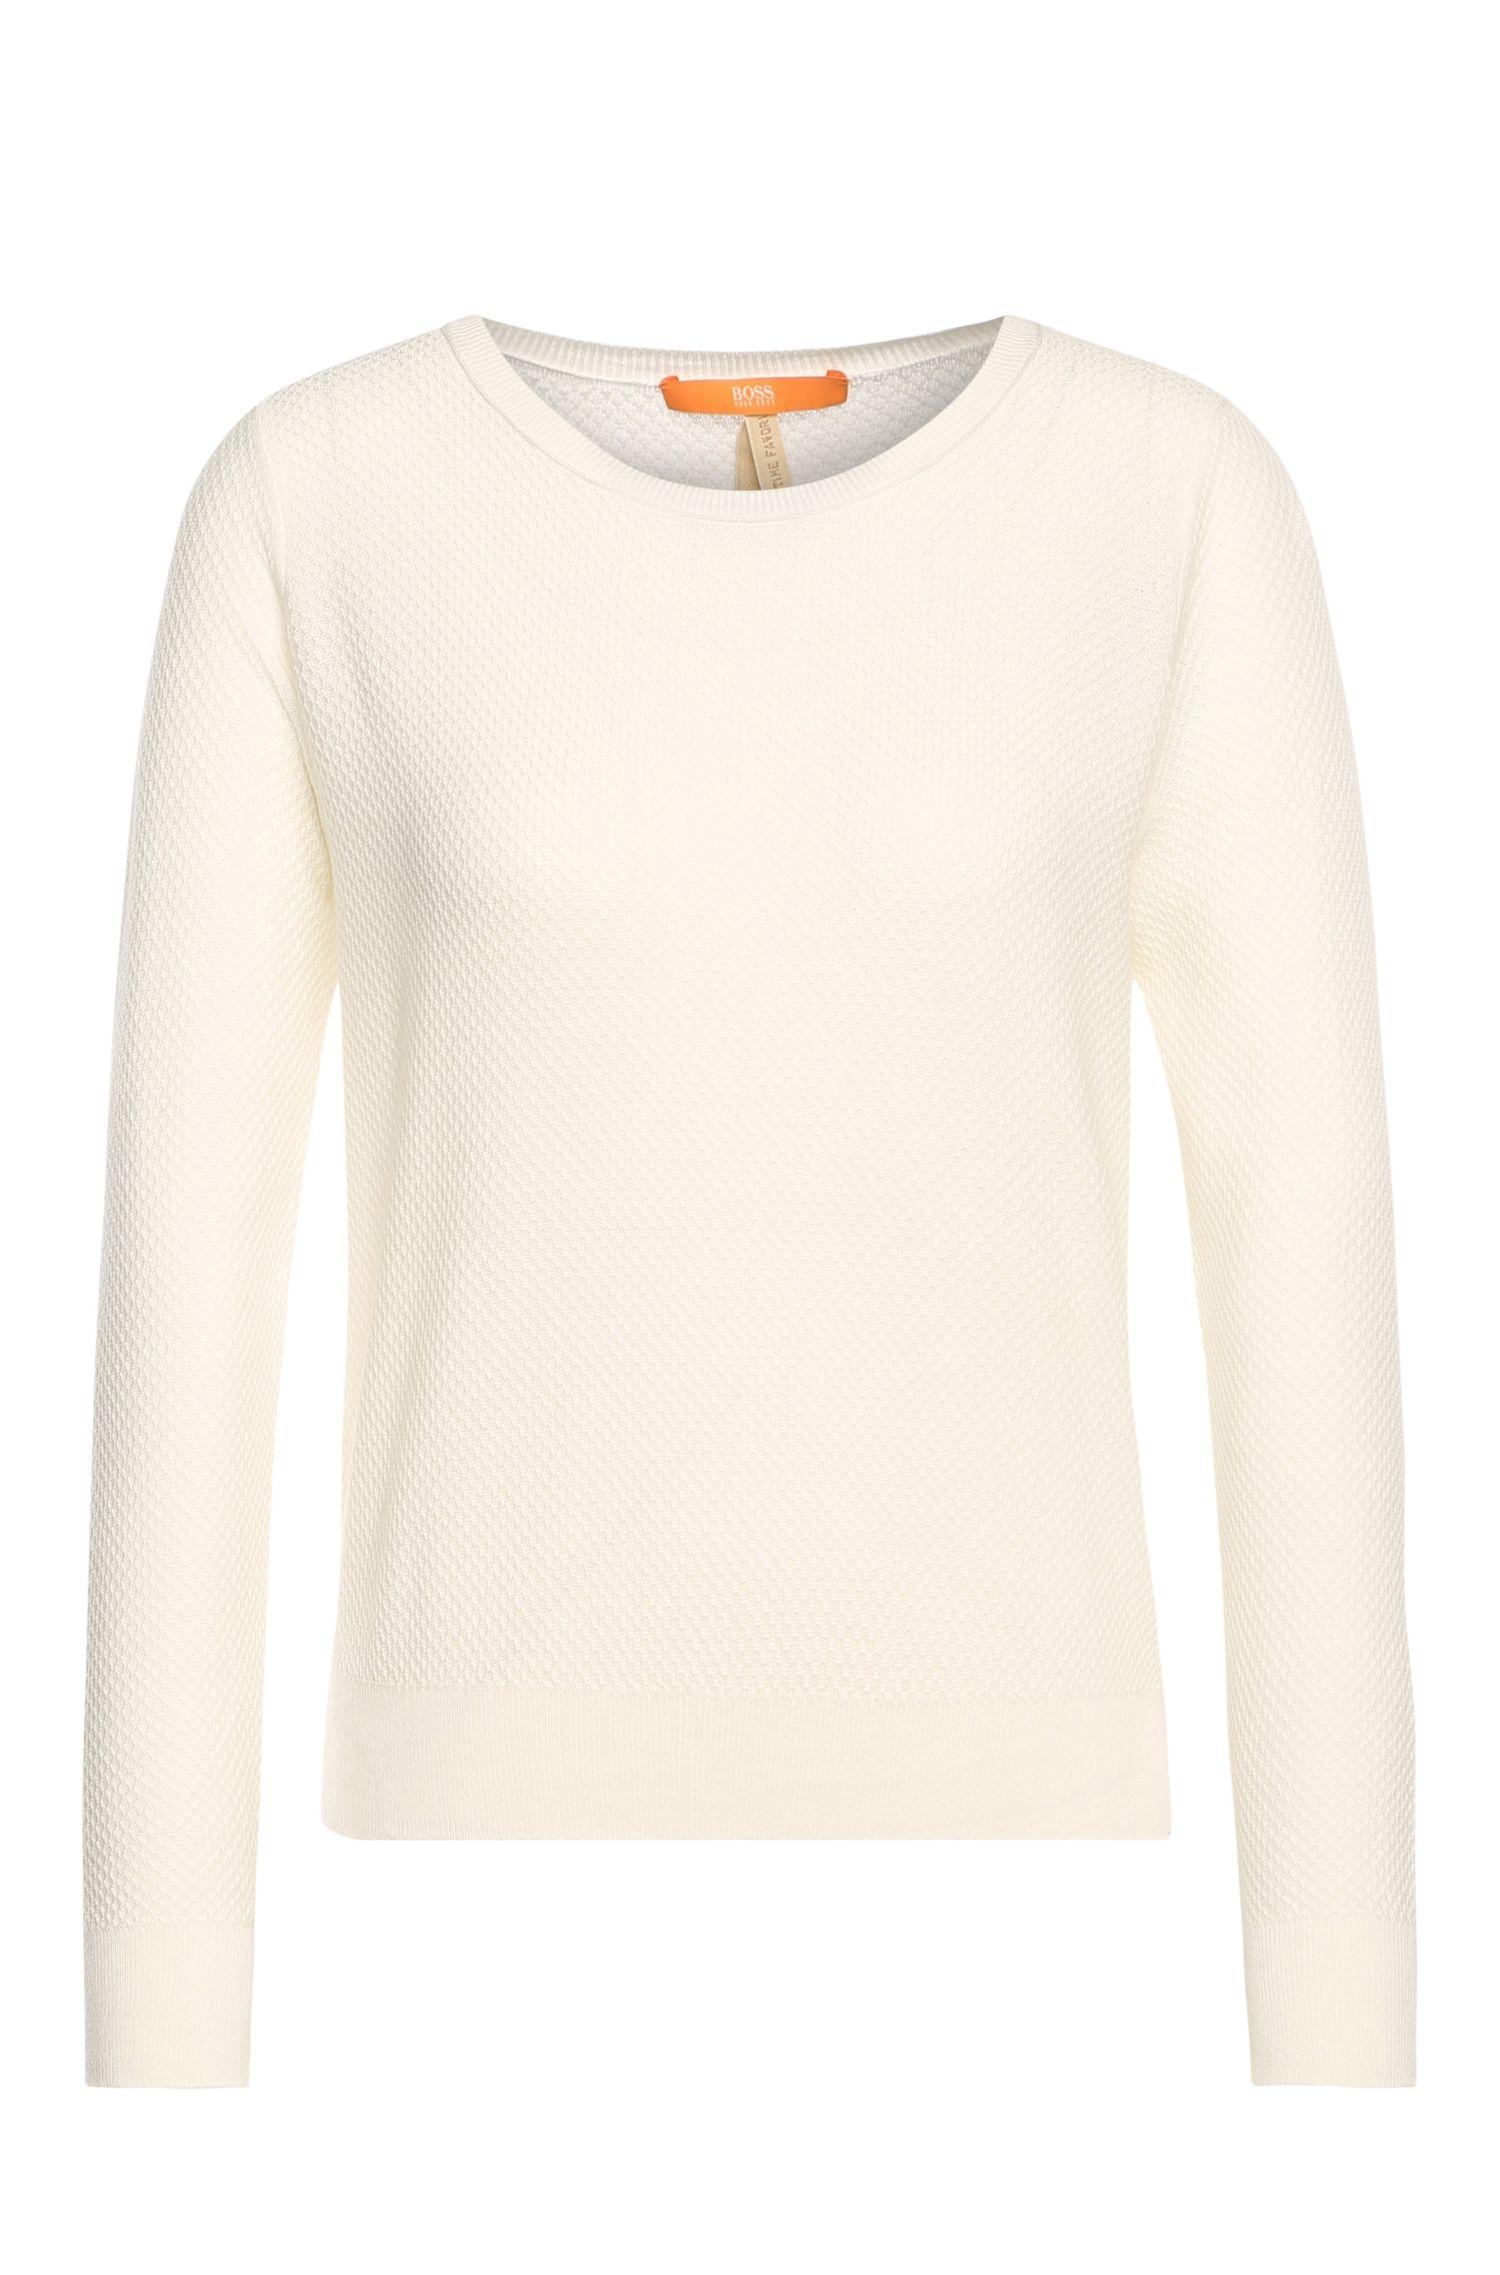 Jersey en mezcla de algodón en punto con textura: 'Injkey'